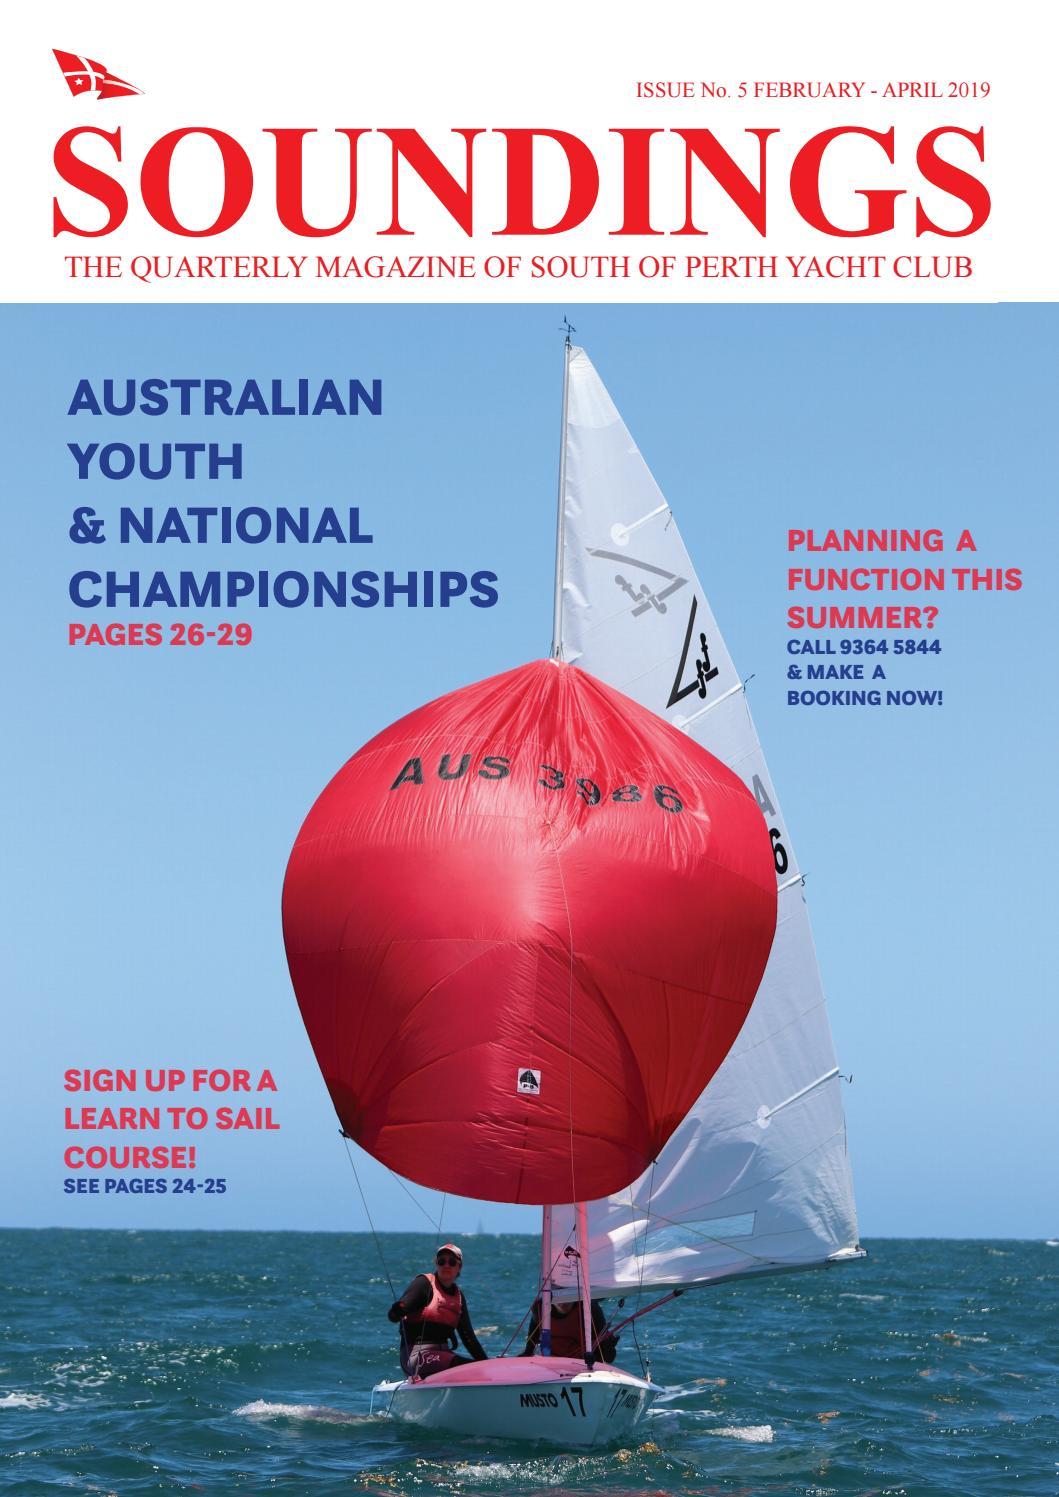 South of Perth Yacht Club Soundings Magazine February 2019